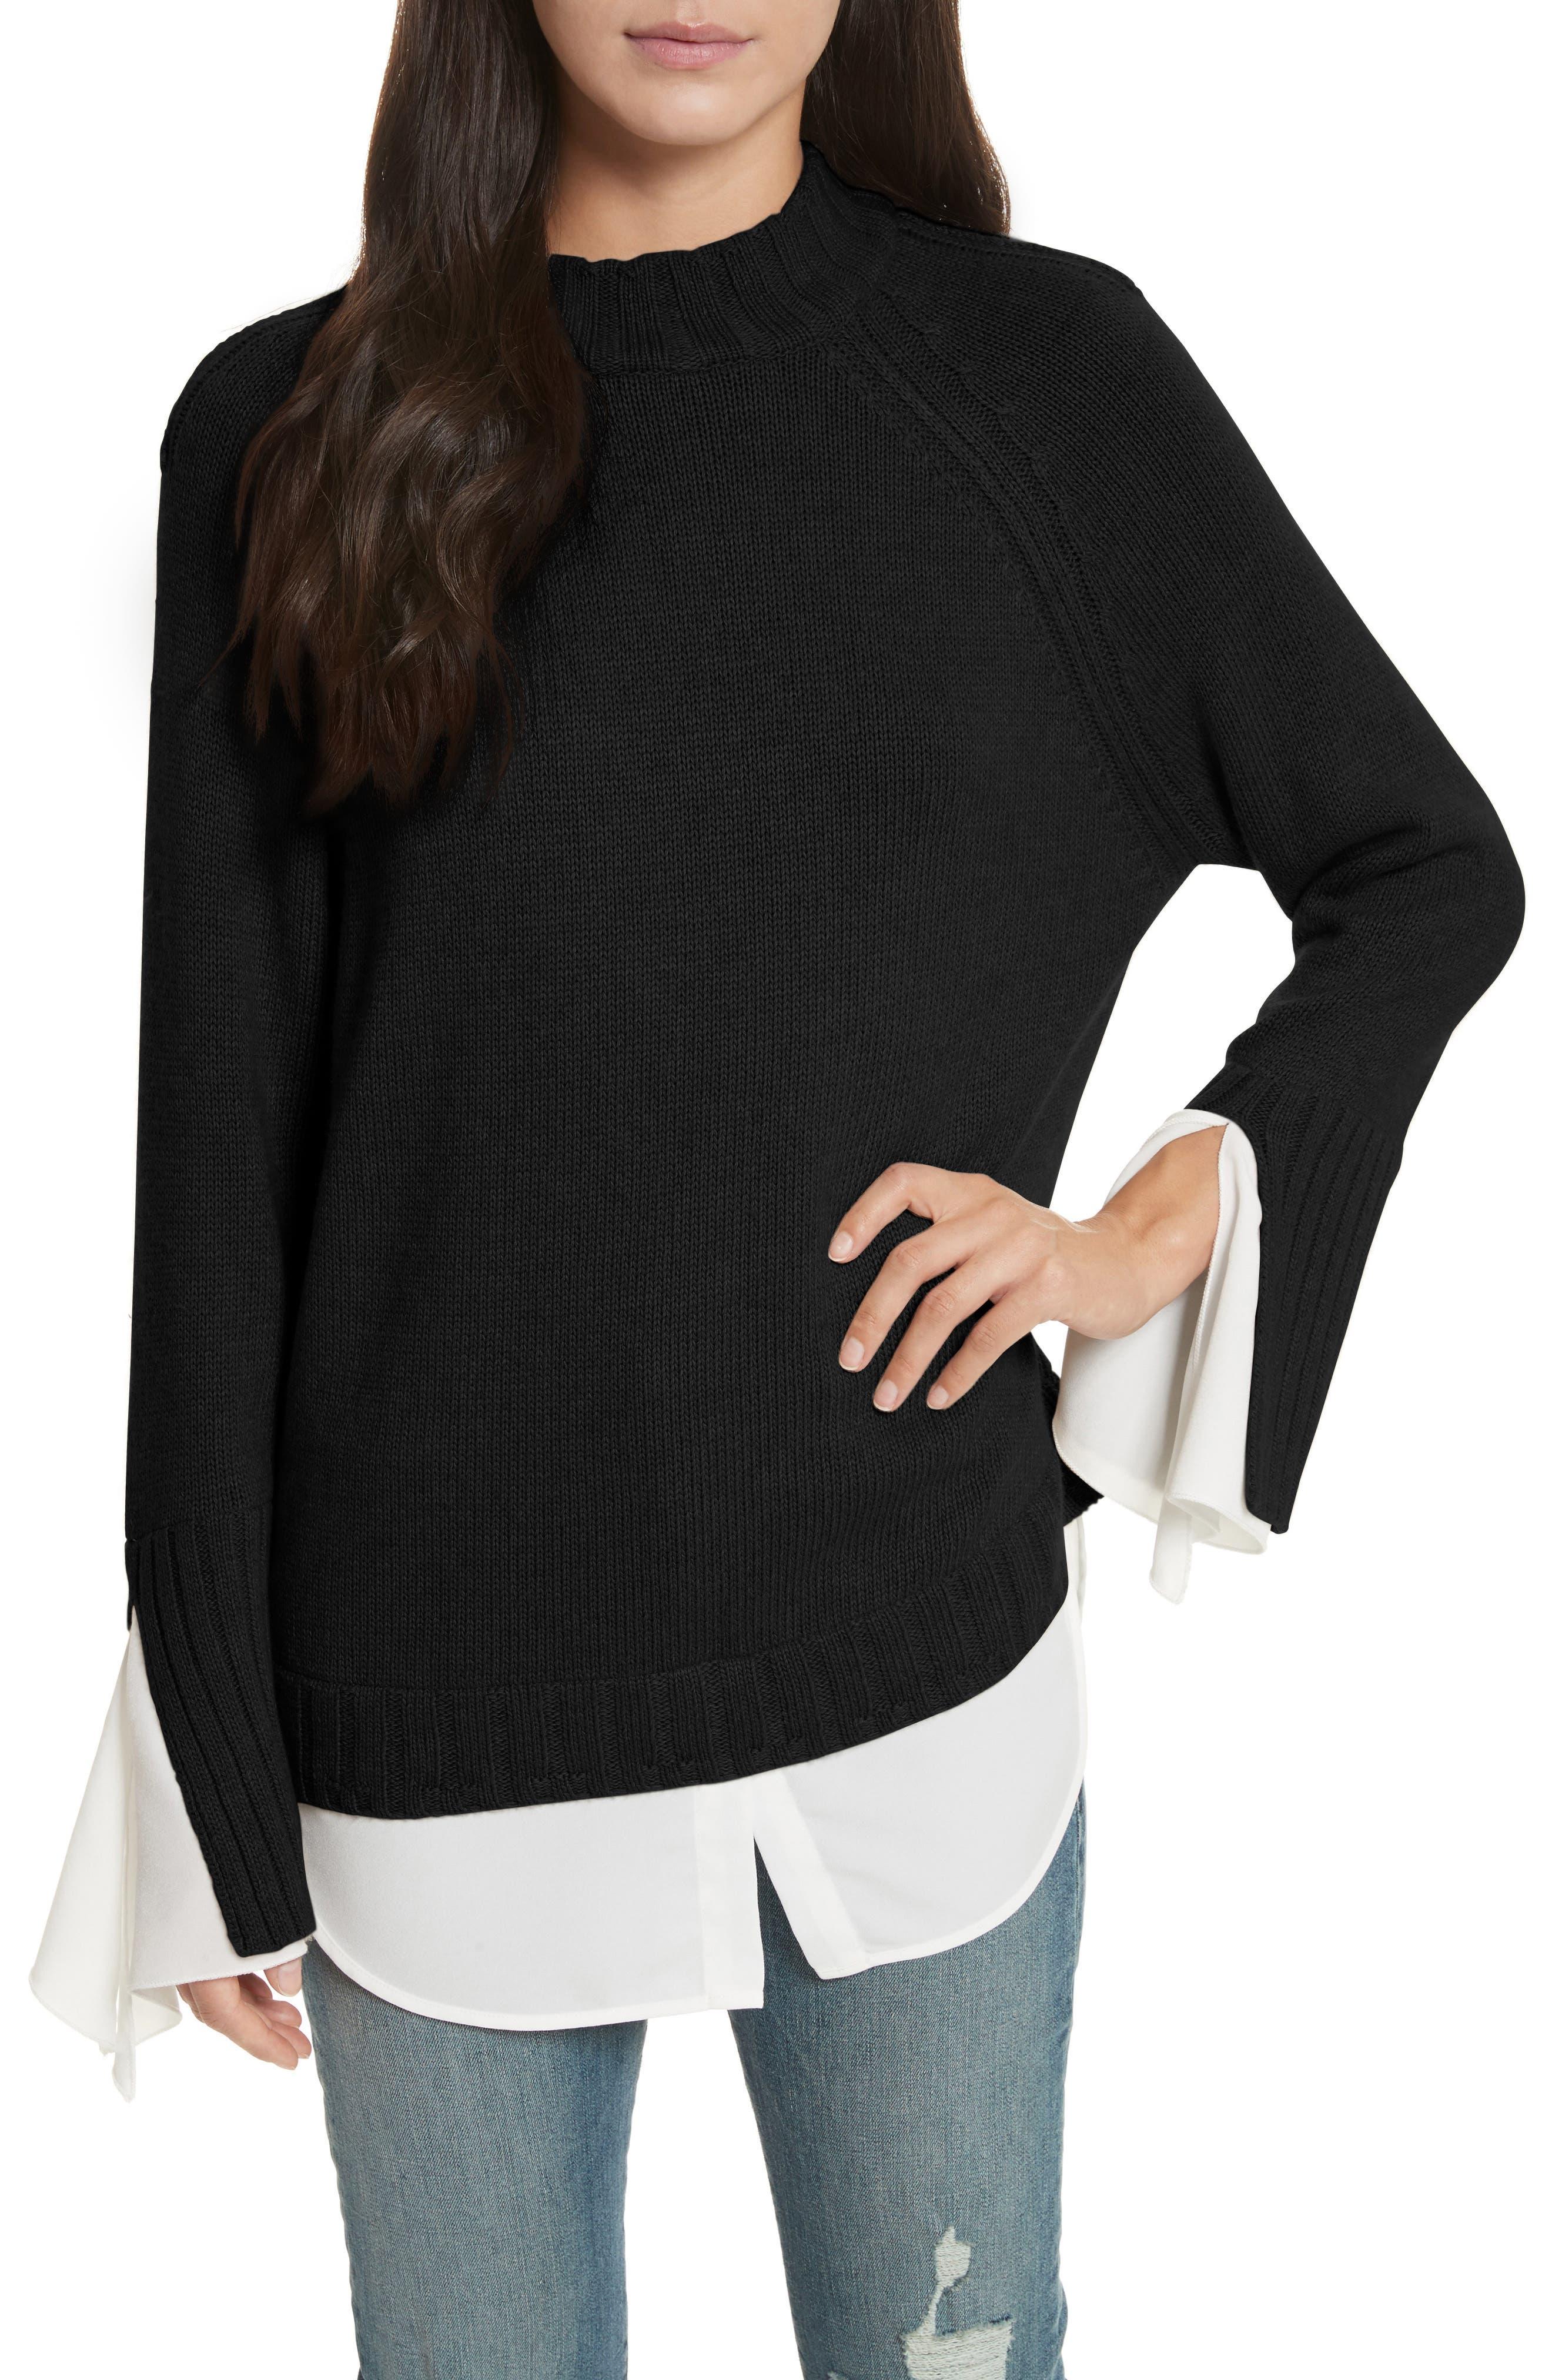 Remi Layered Pullover,                             Main thumbnail 1, color,                             Black/ White